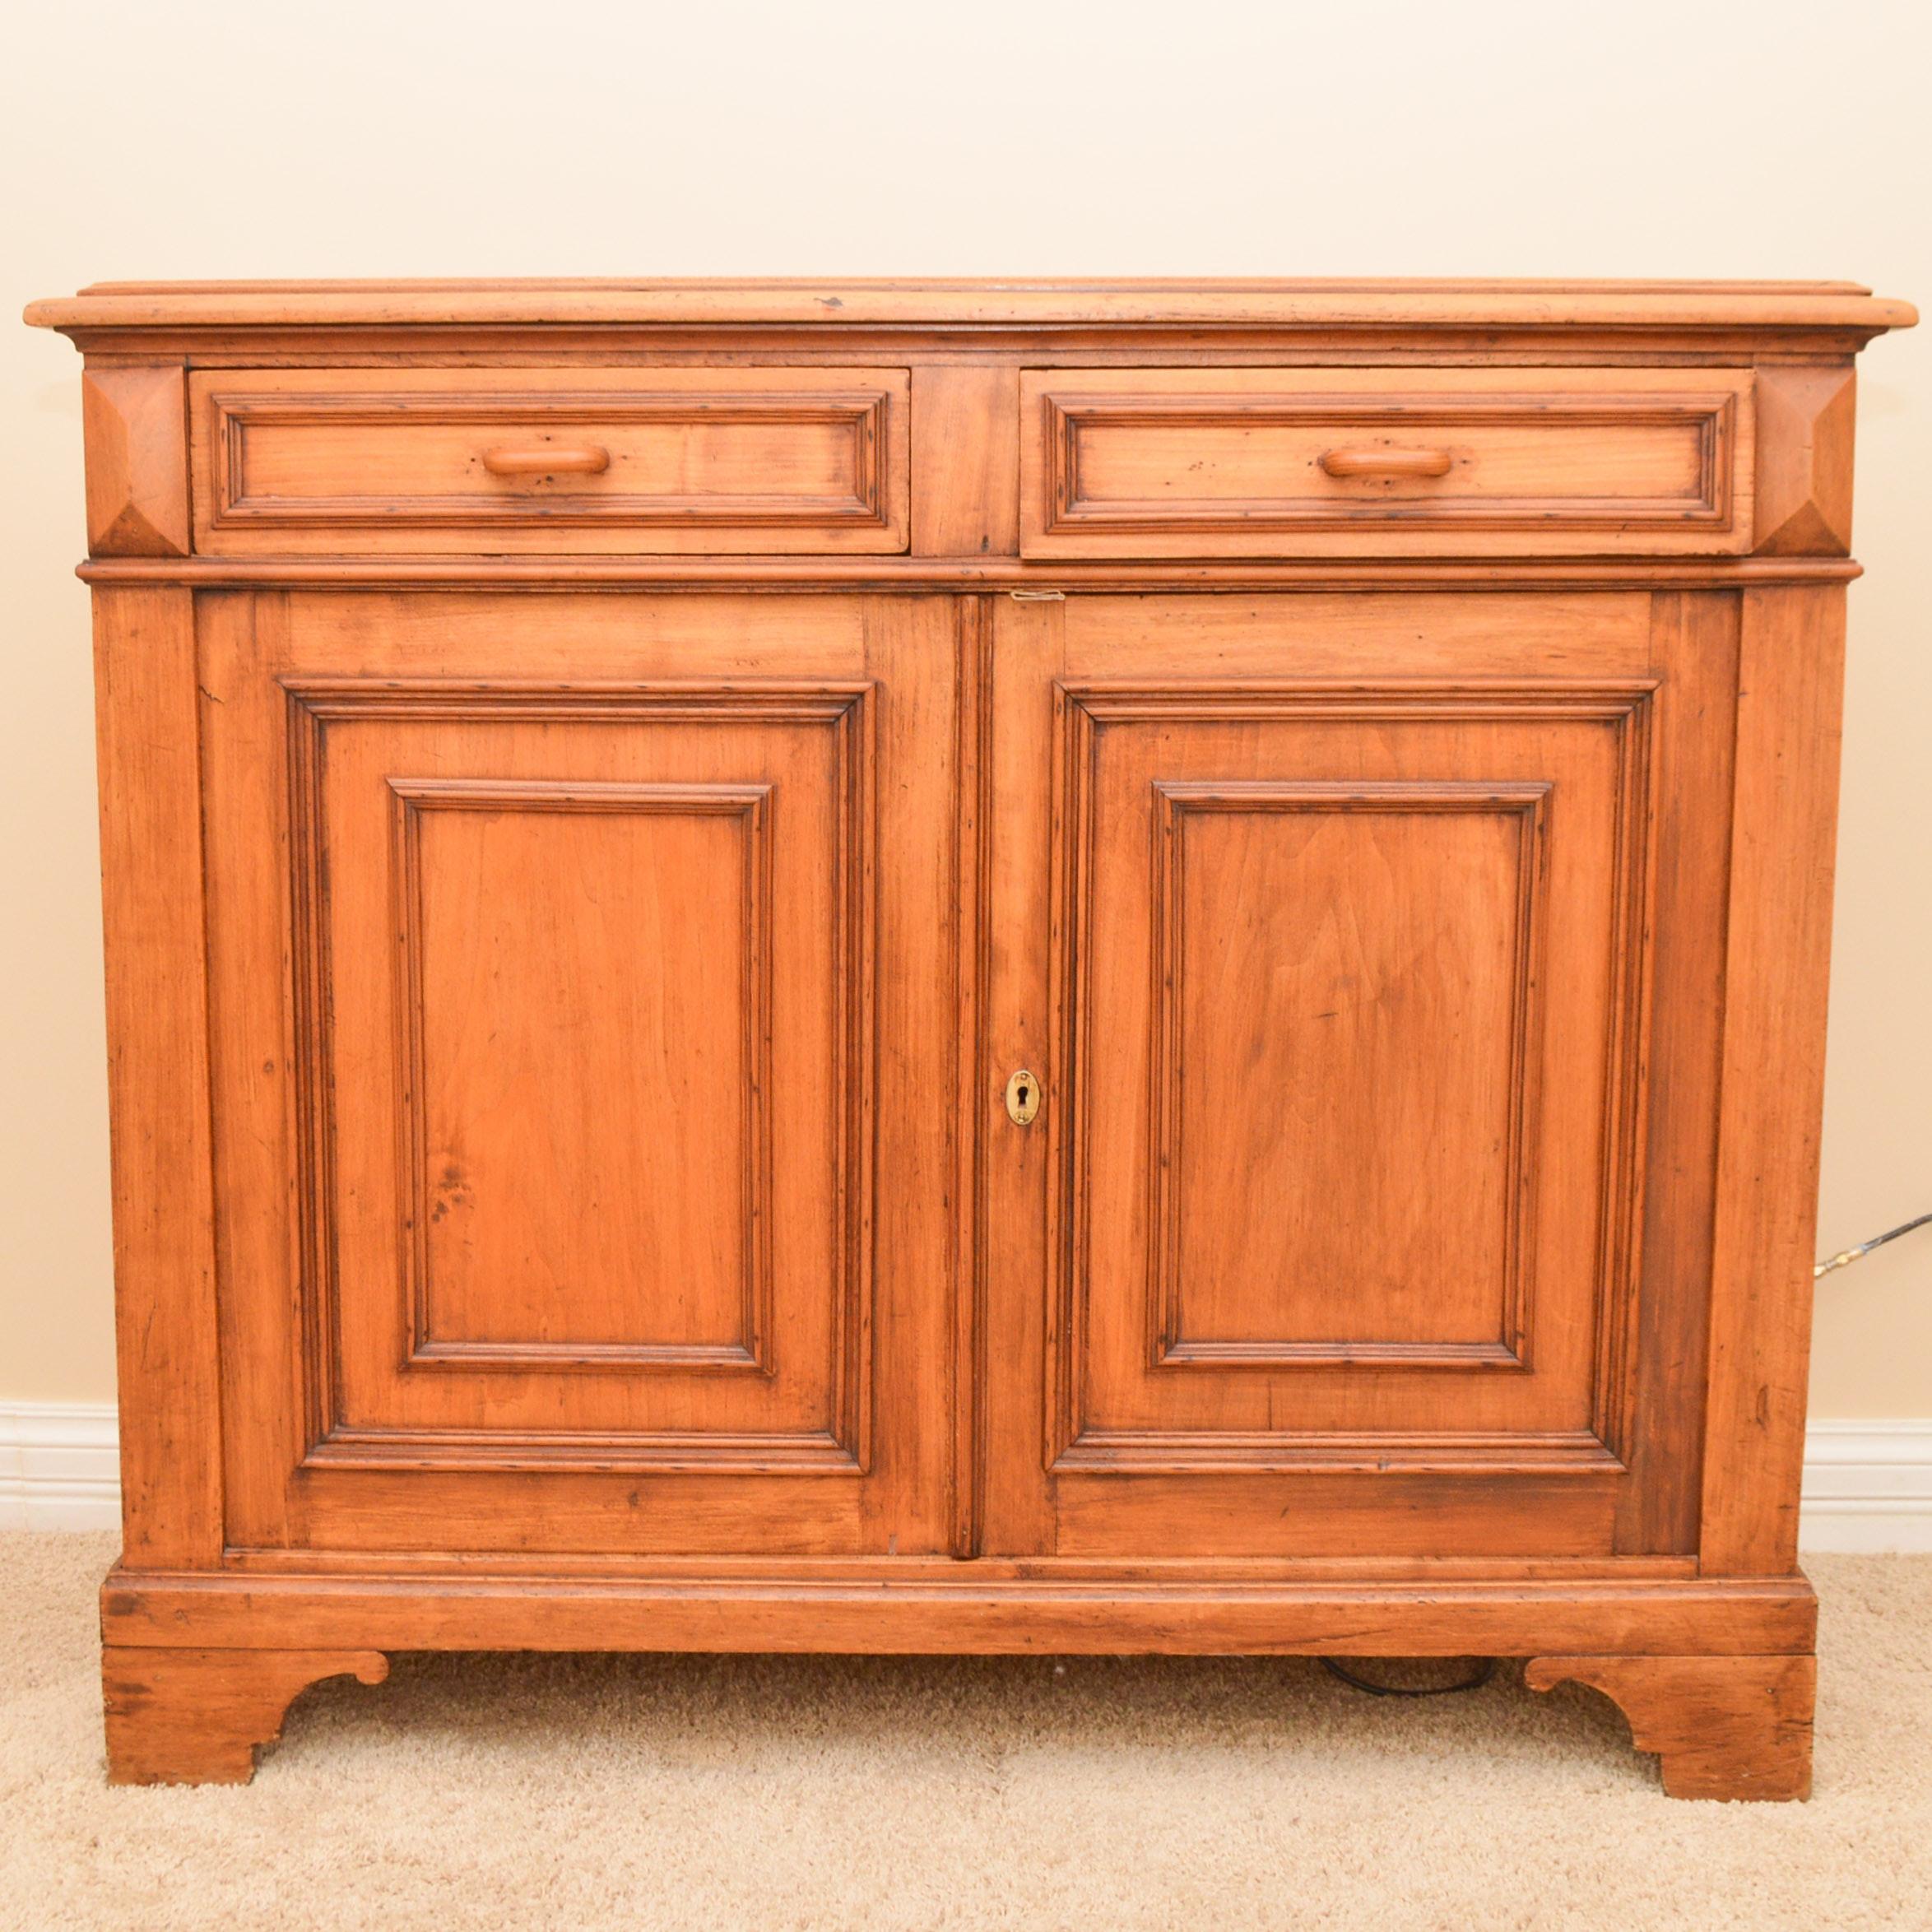 Antique Two Door Cabinet in Wormy Chestnut Wood